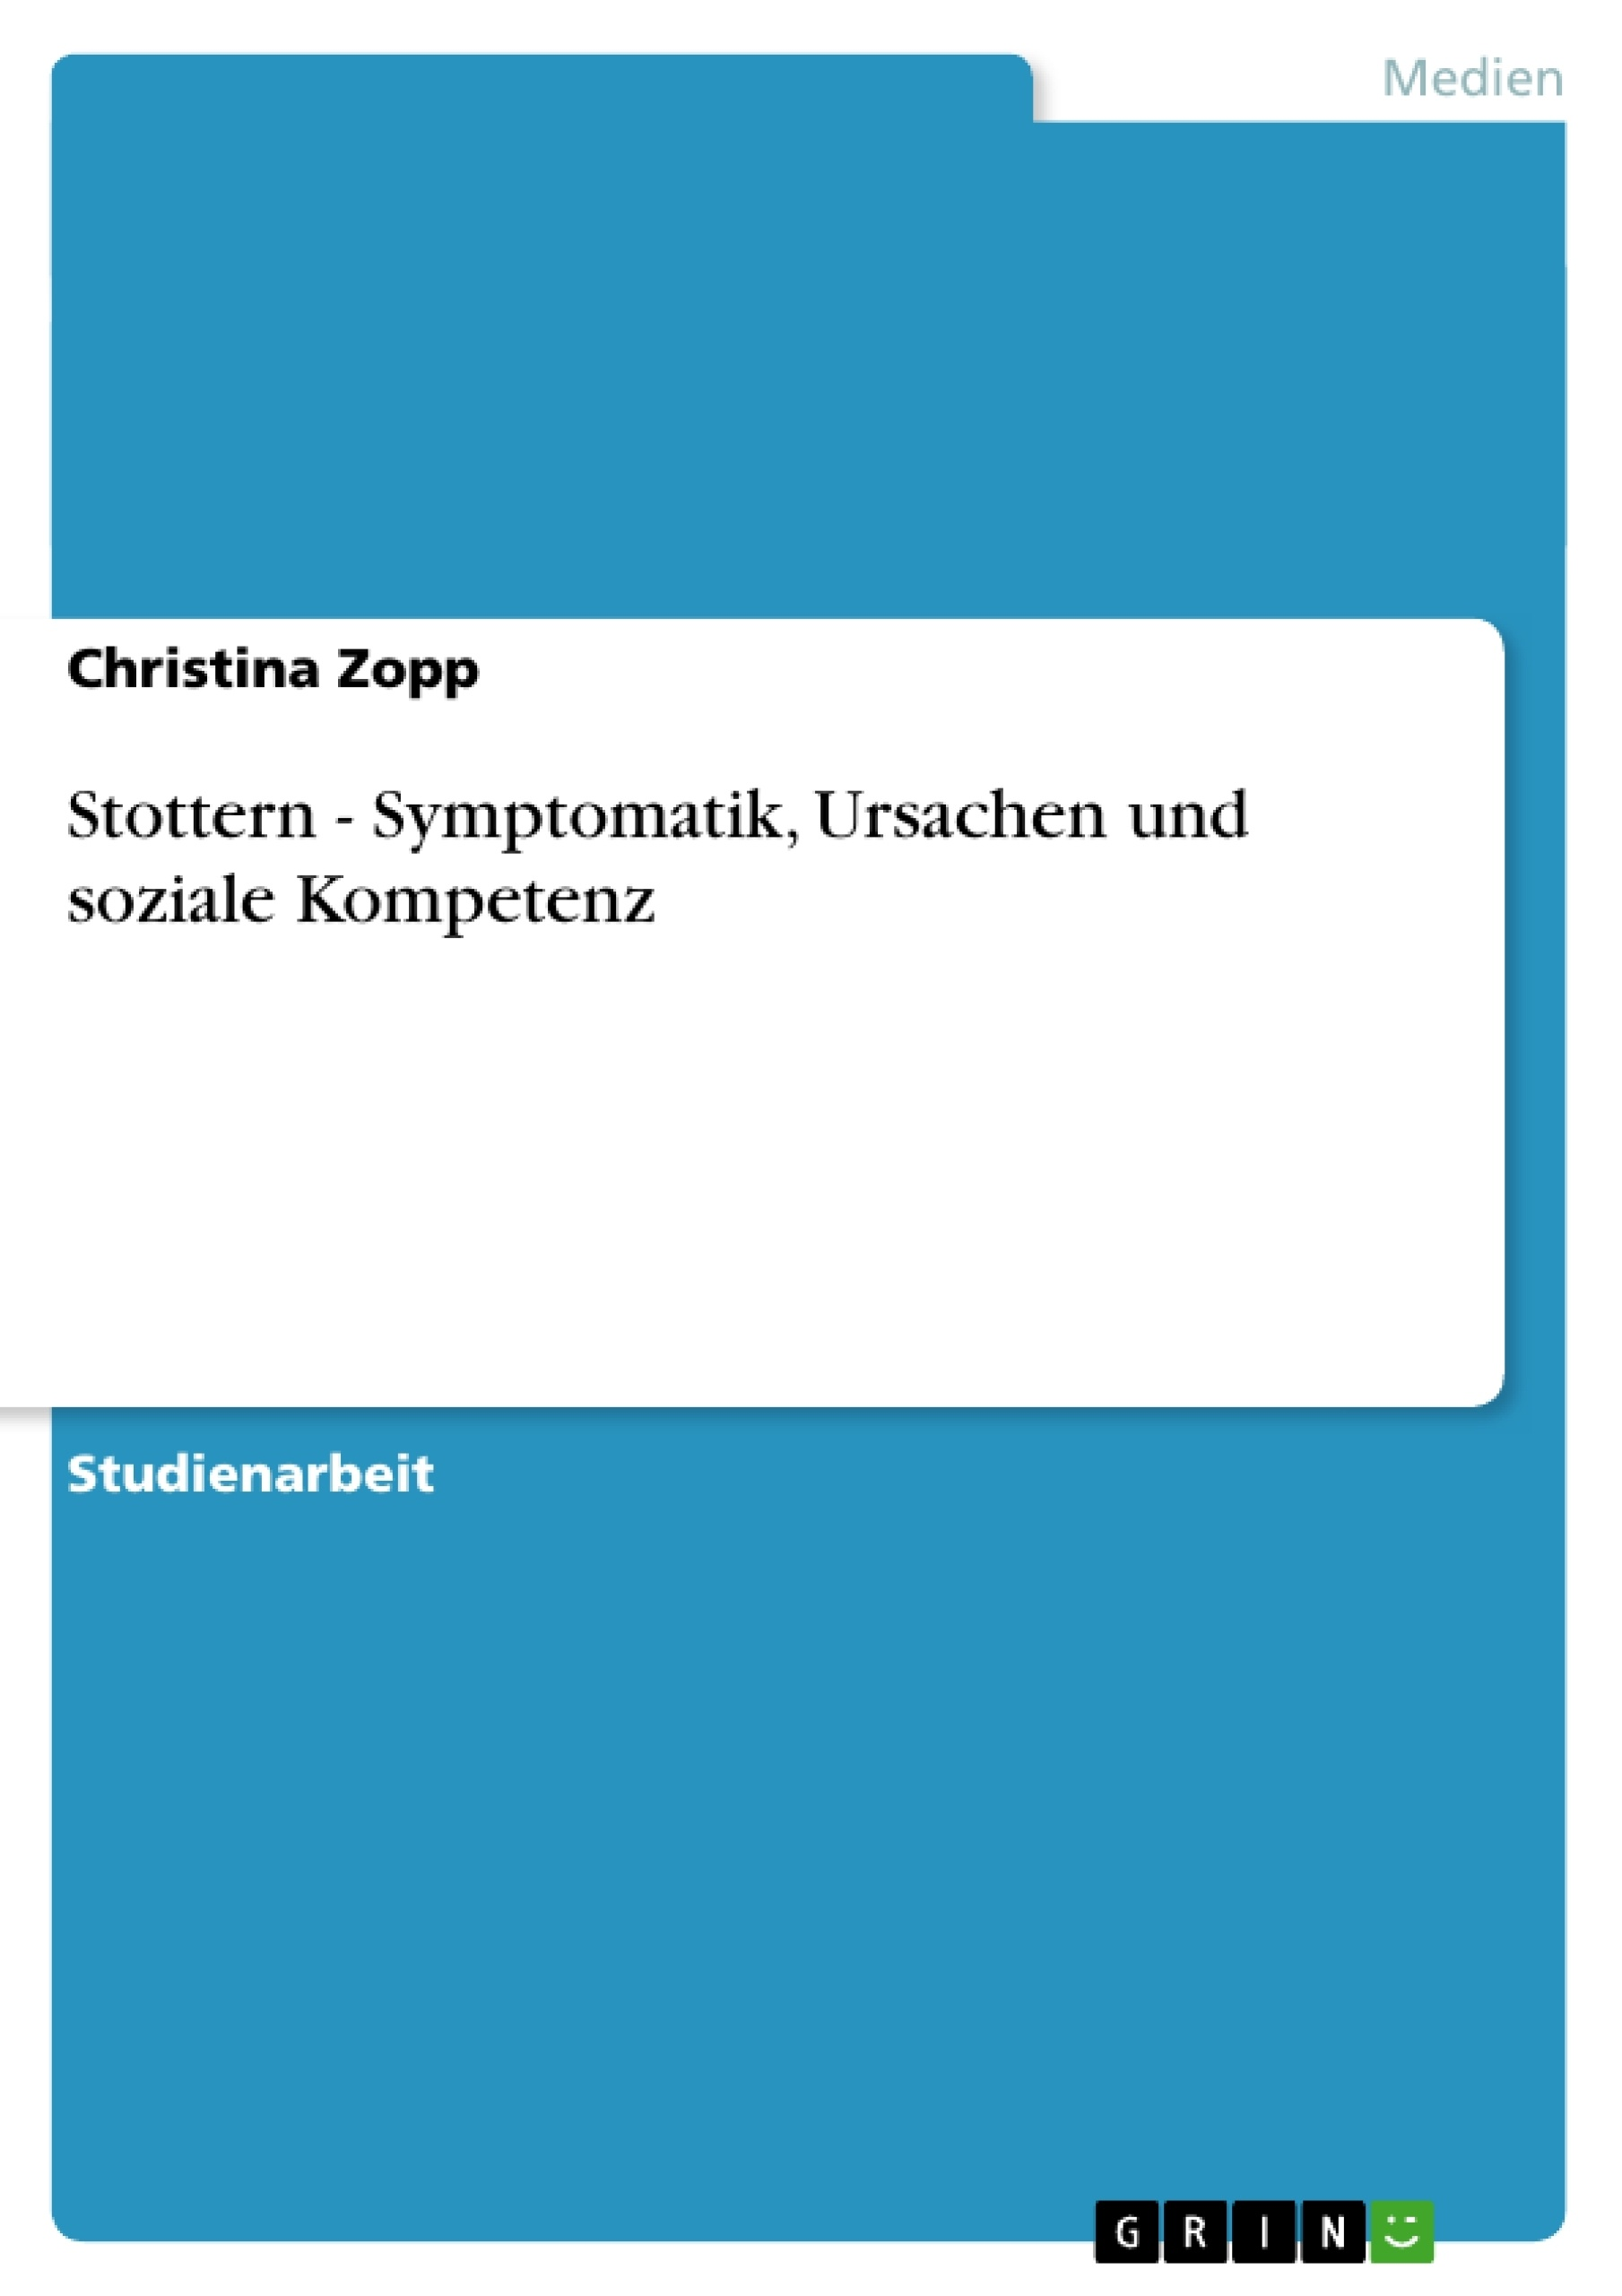 Titel: Stottern - Symptomatik, Ursachen und soziale Kompetenz